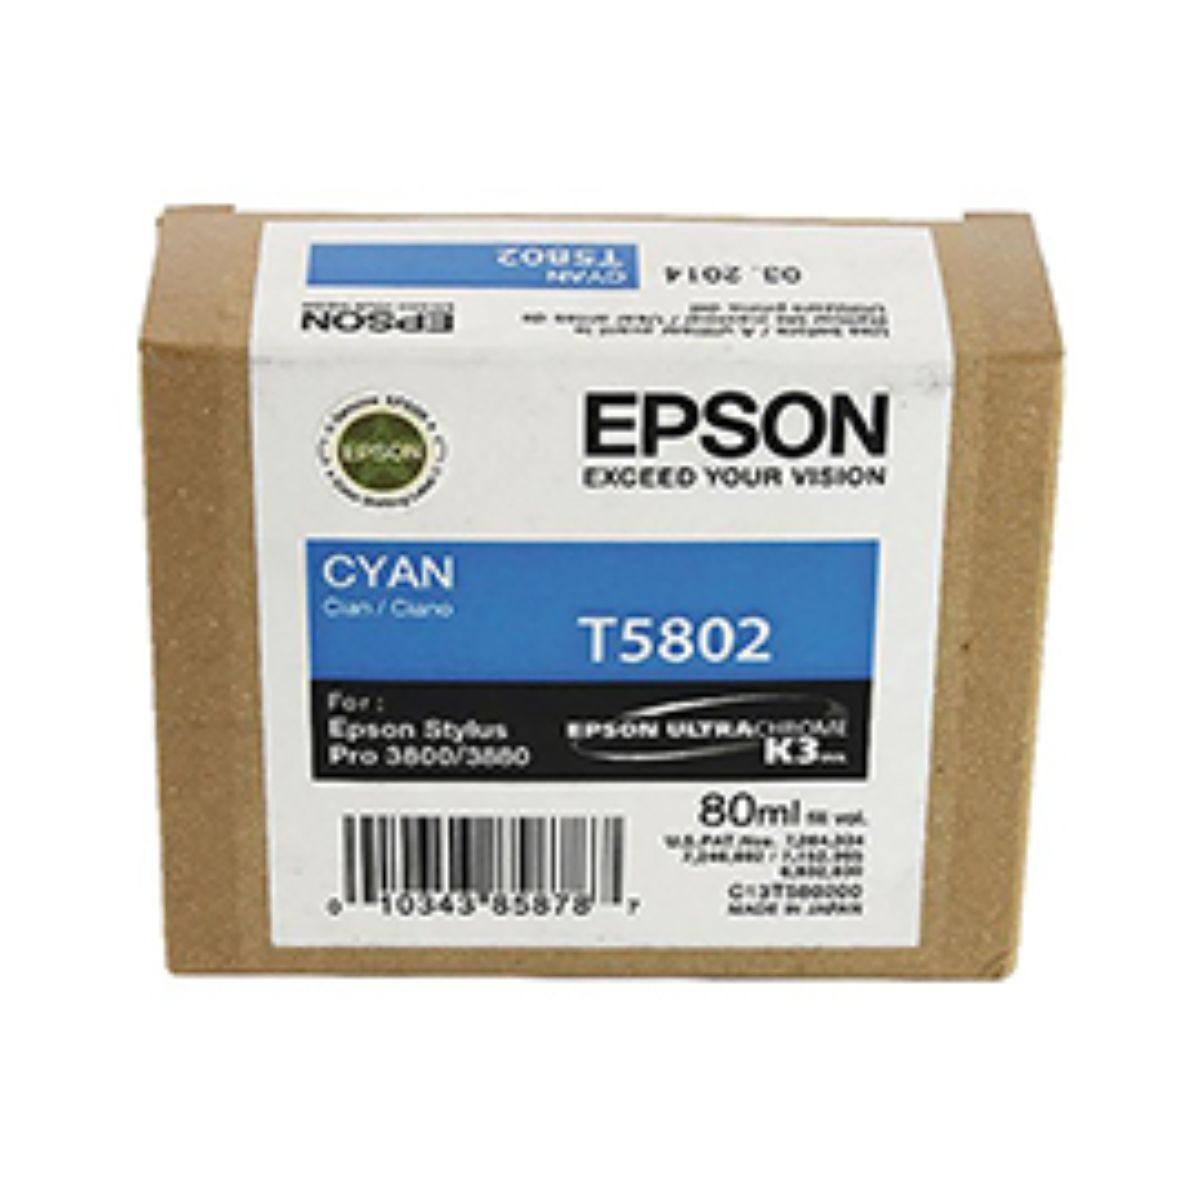 Epson PRO3880 Ink Cartridge Cyan